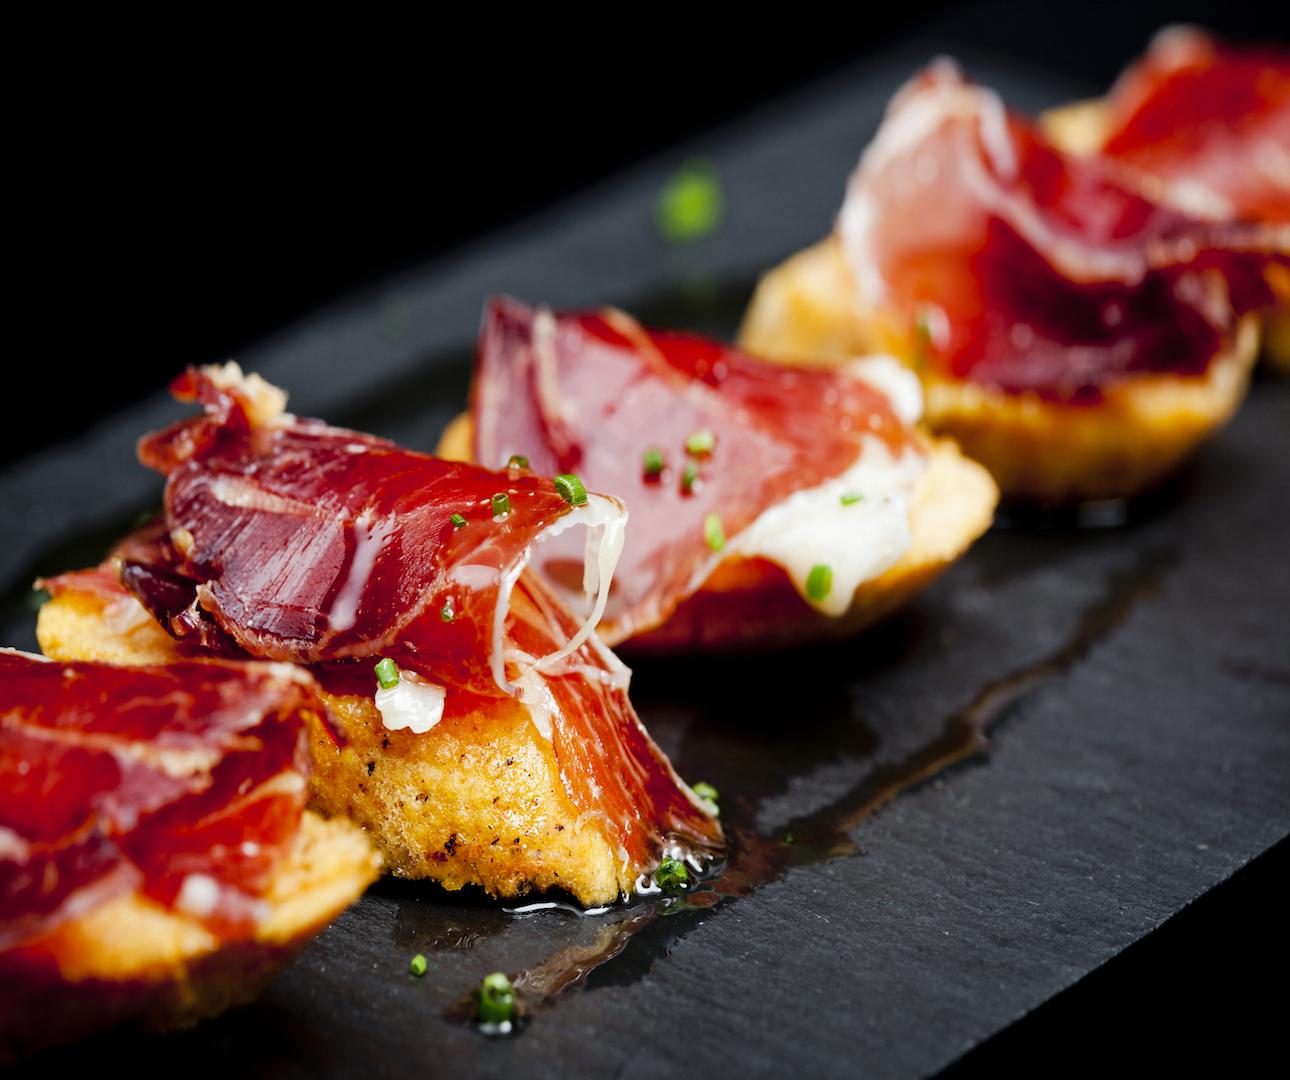 How to Order Food in Spain